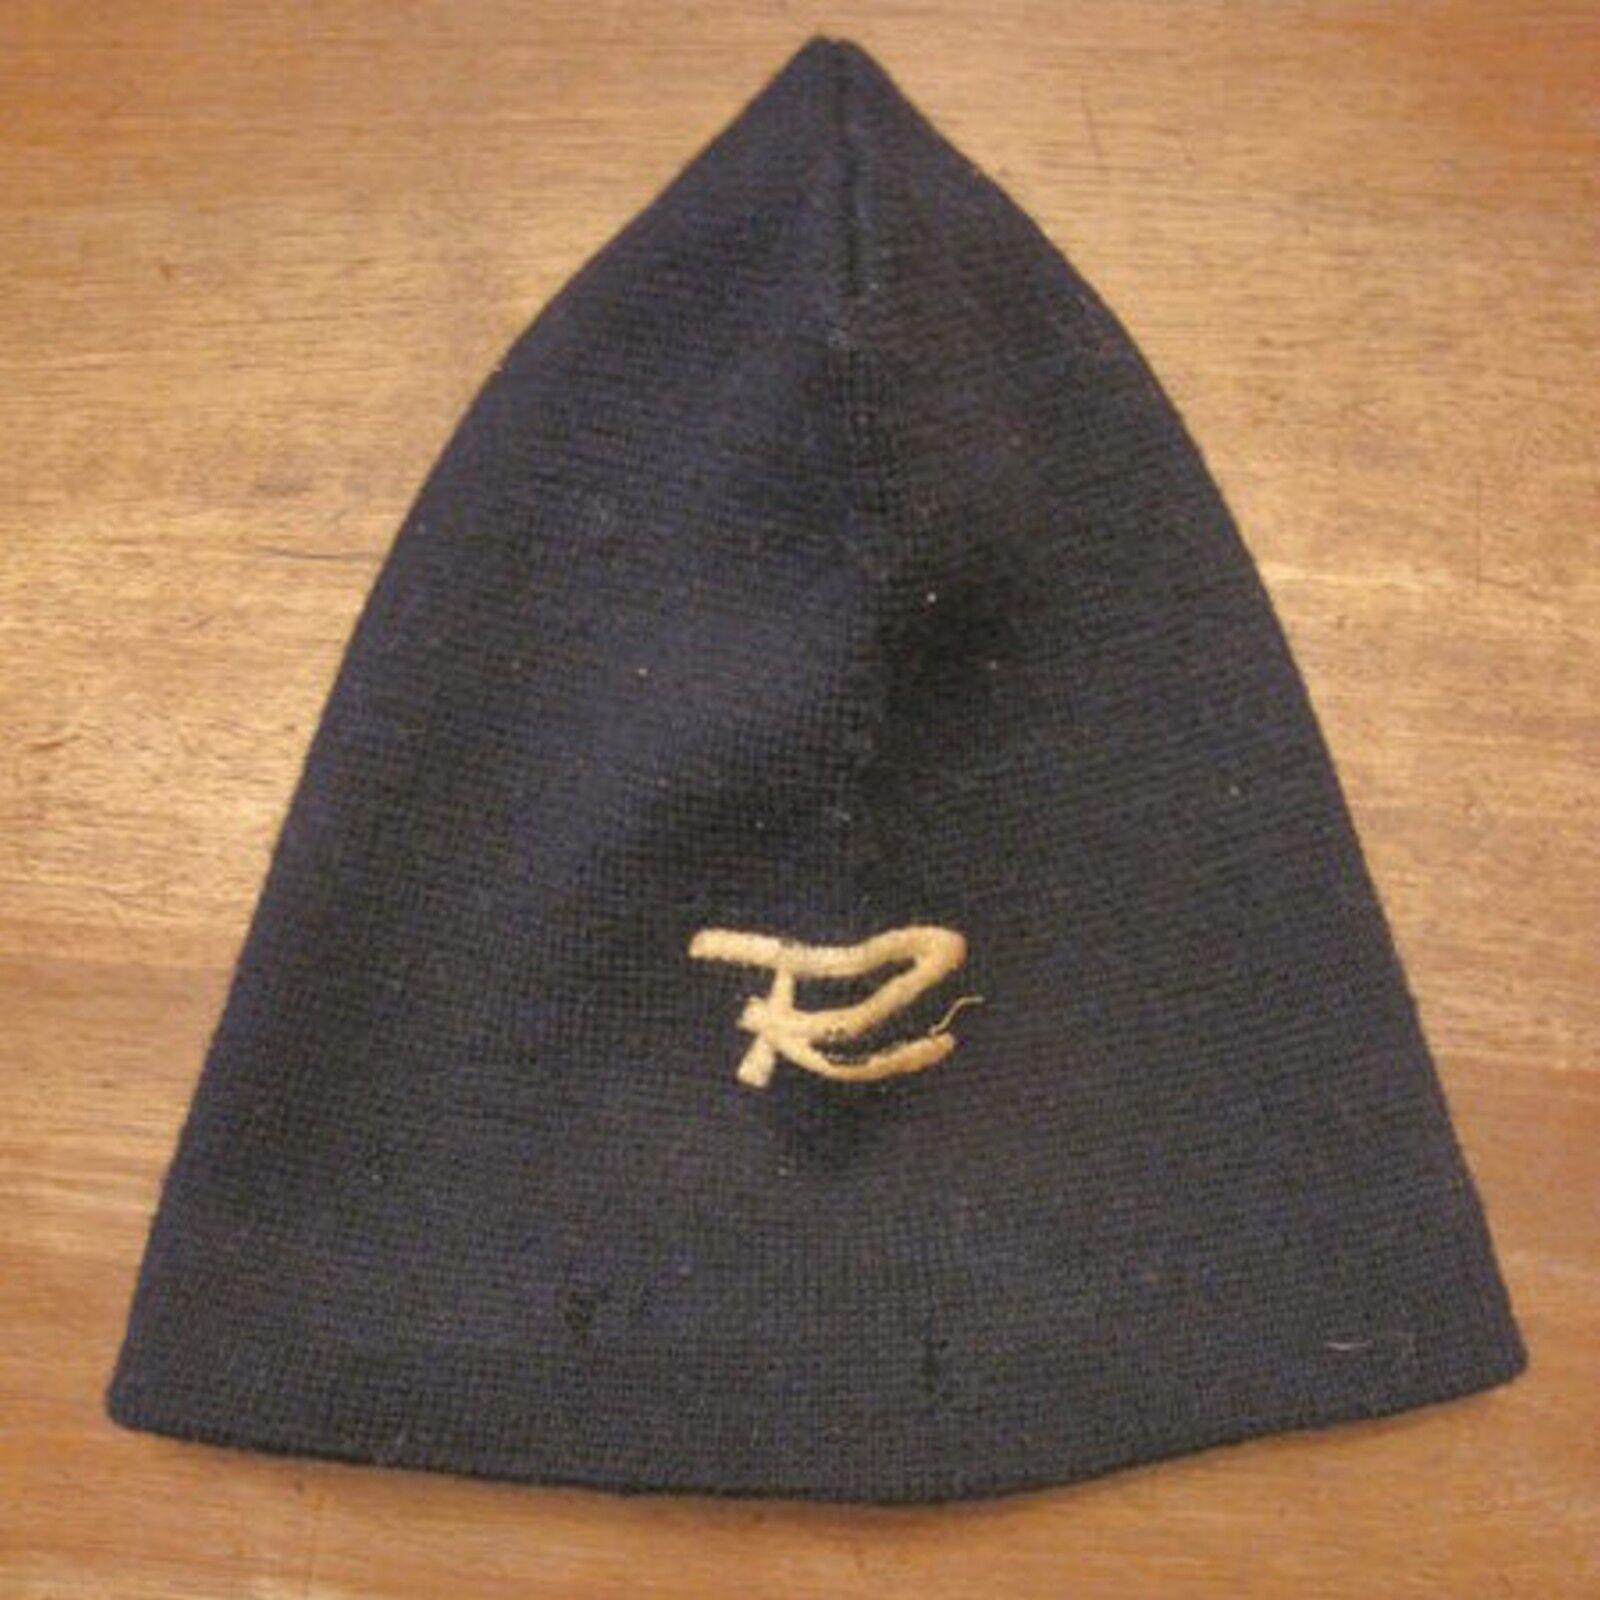 Cuffia lana elastica cap vintage sci berretto Italian cape ski cap elastica Rossignol R logo bdd73d